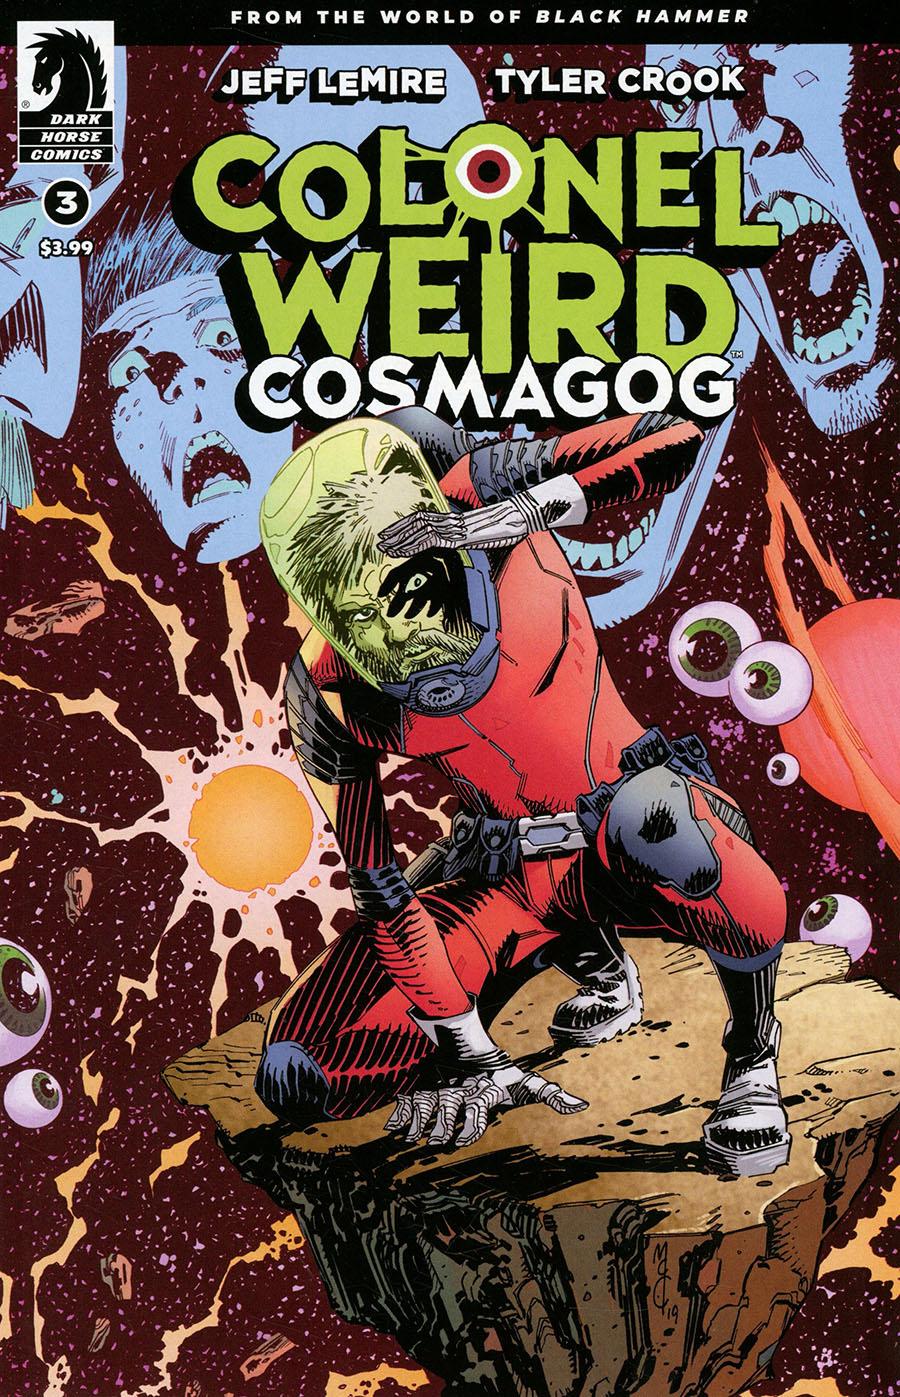 Colonel Weird Cosmagog #3 Cover B Variant John McCrea & Mike Spicer Cover